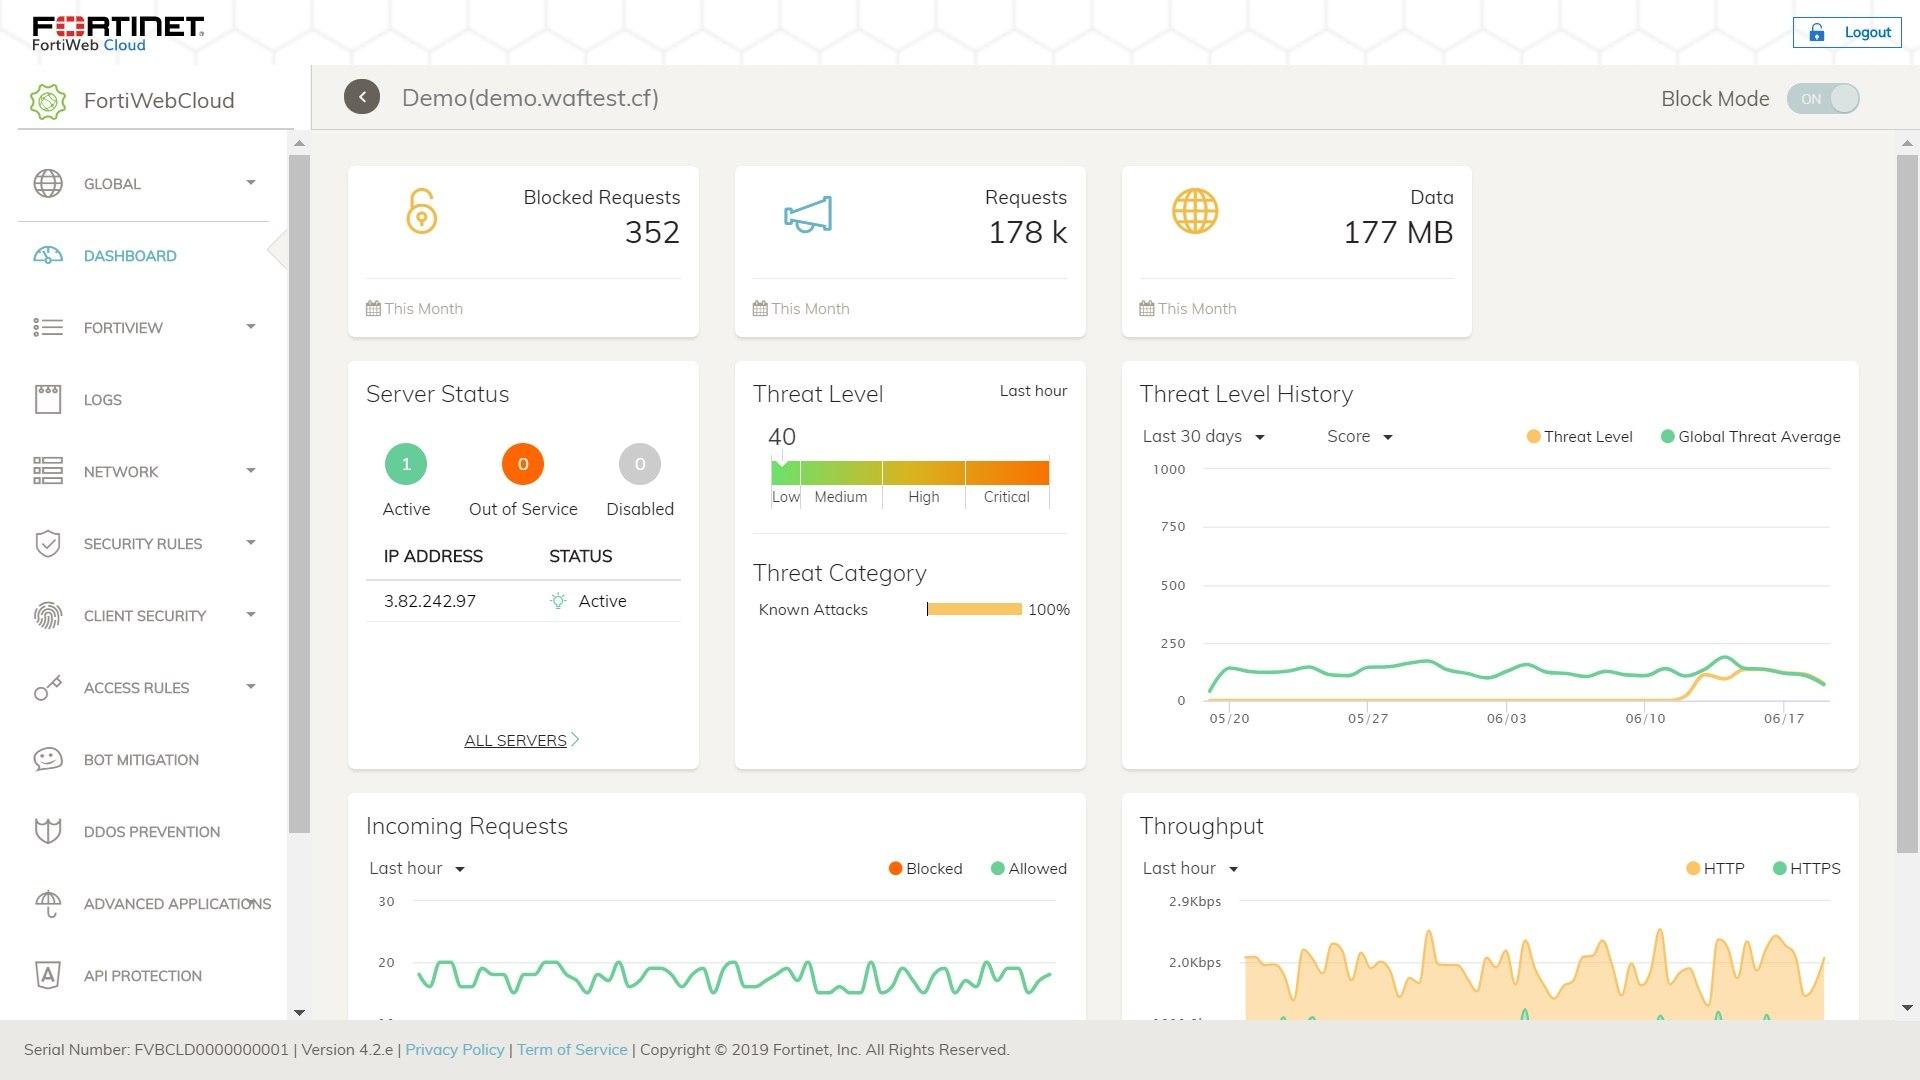 FortiWeb-Cloud-WAF-as-a-Service-ScreenShot.jpg